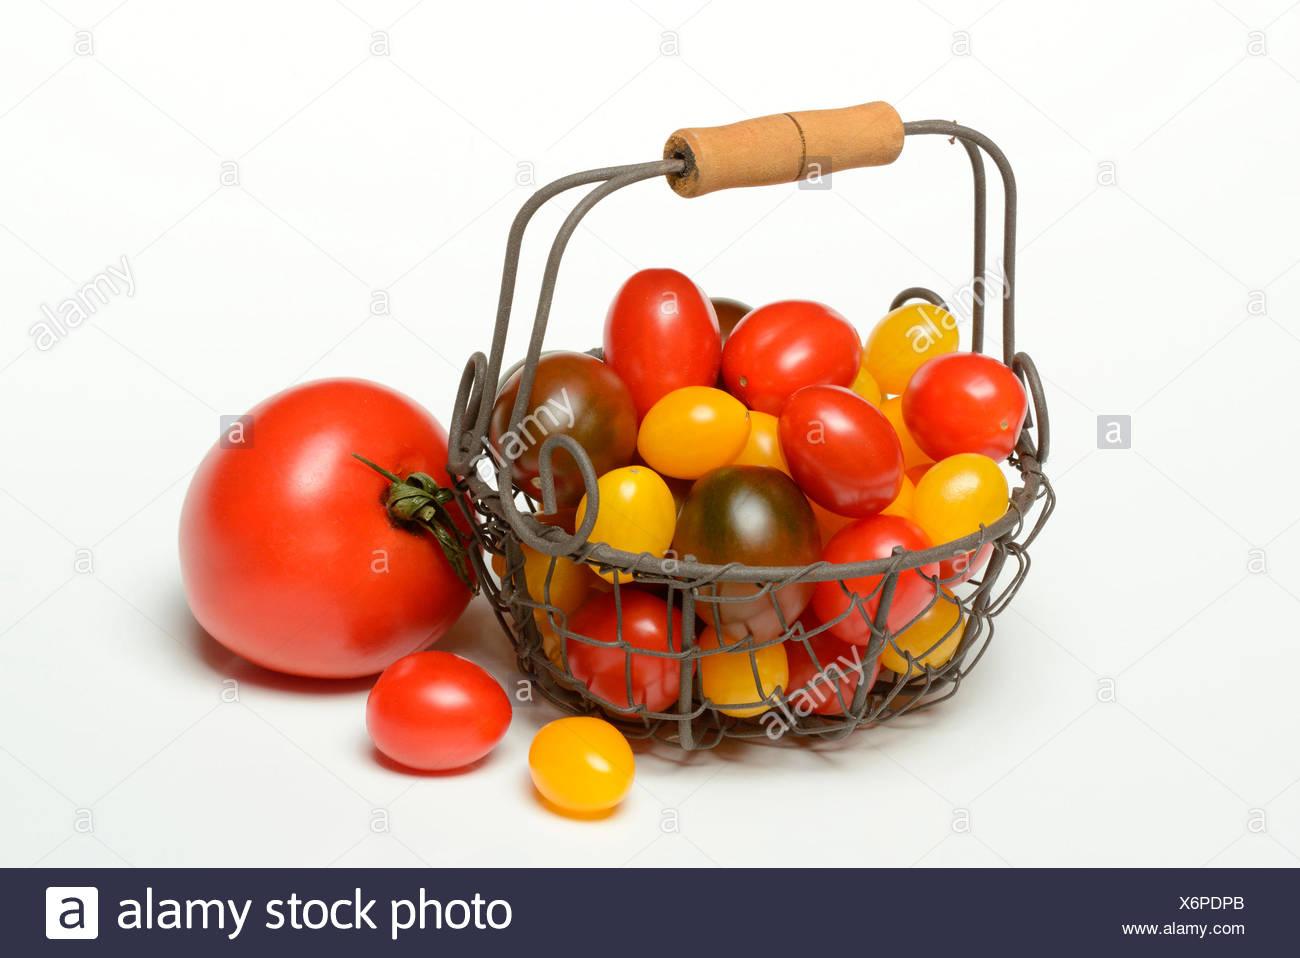 Cherry tomatoes / (Solanum lycopersicum) - Stock Image